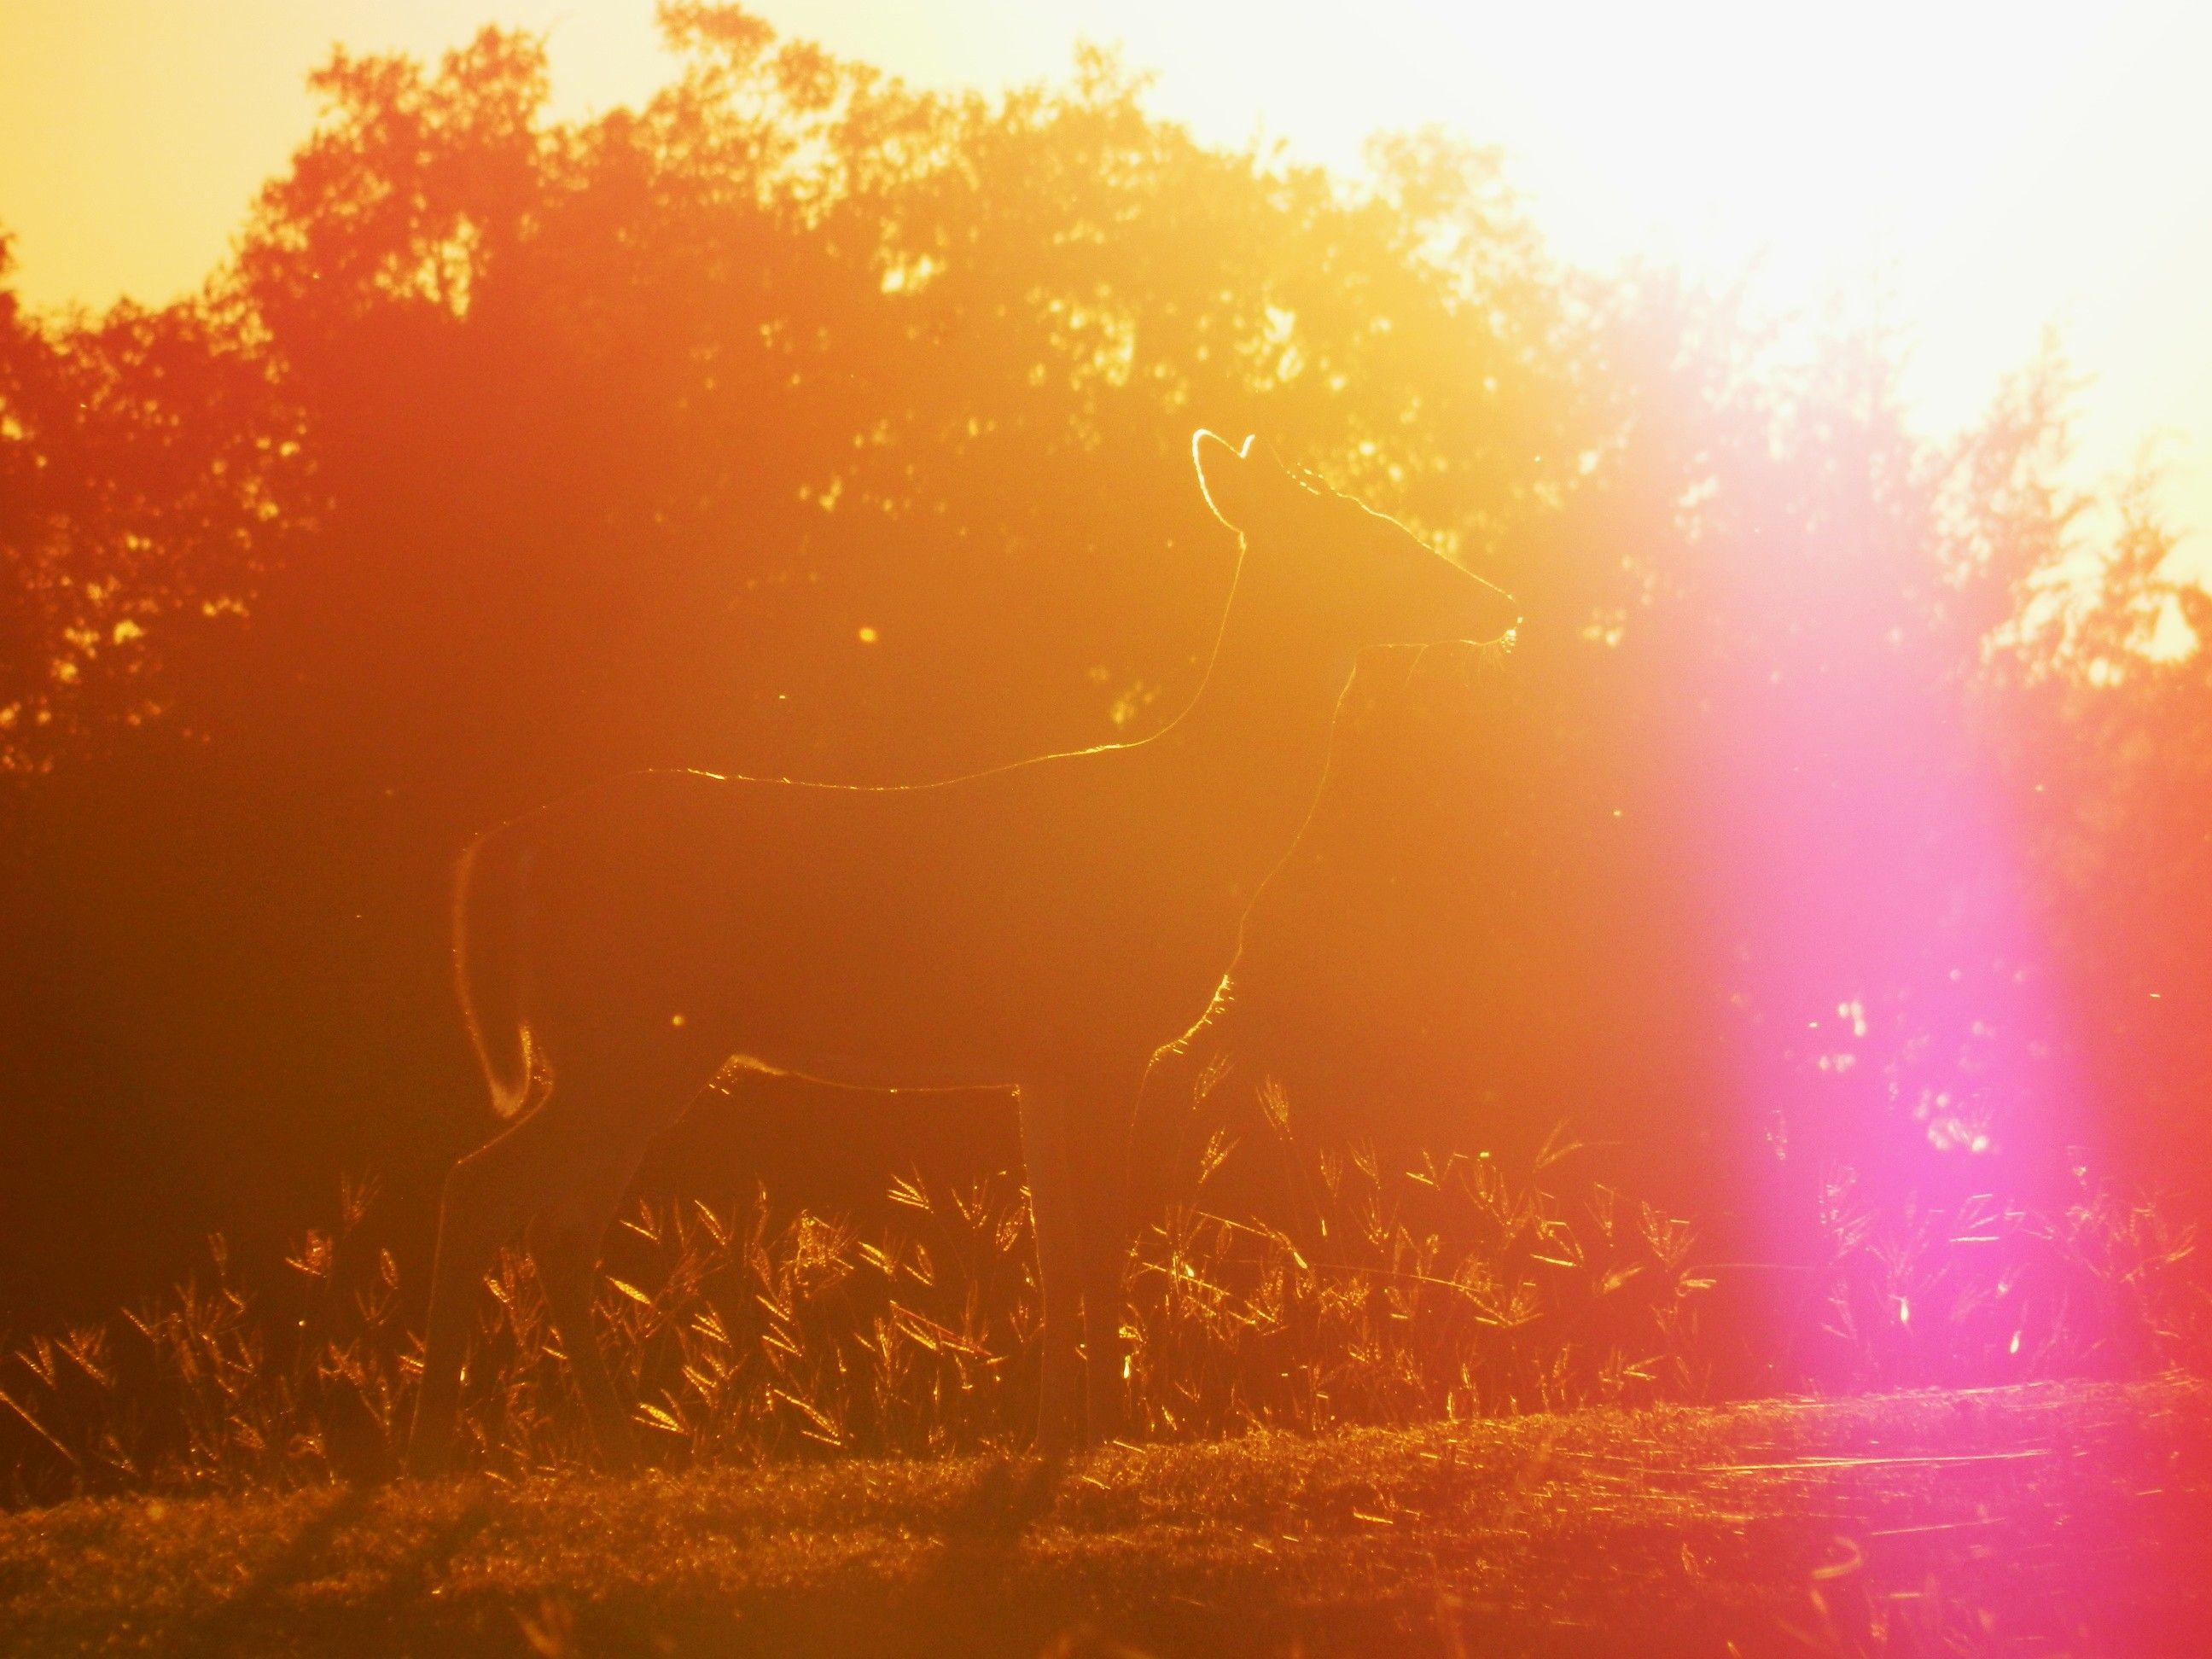 A deer in the sun